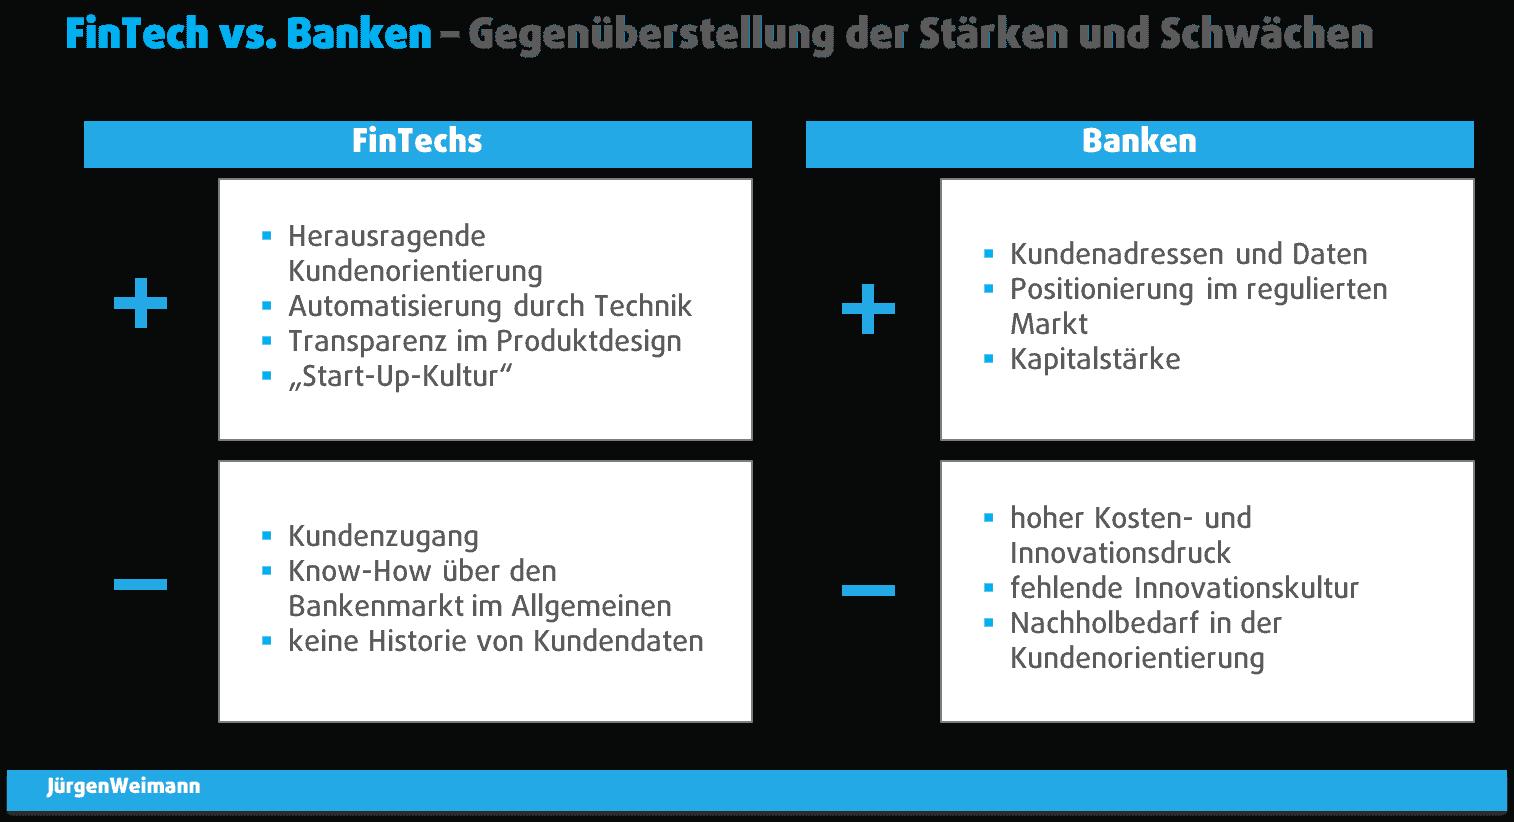 Gegenüberstellung FinTech vs. Banken